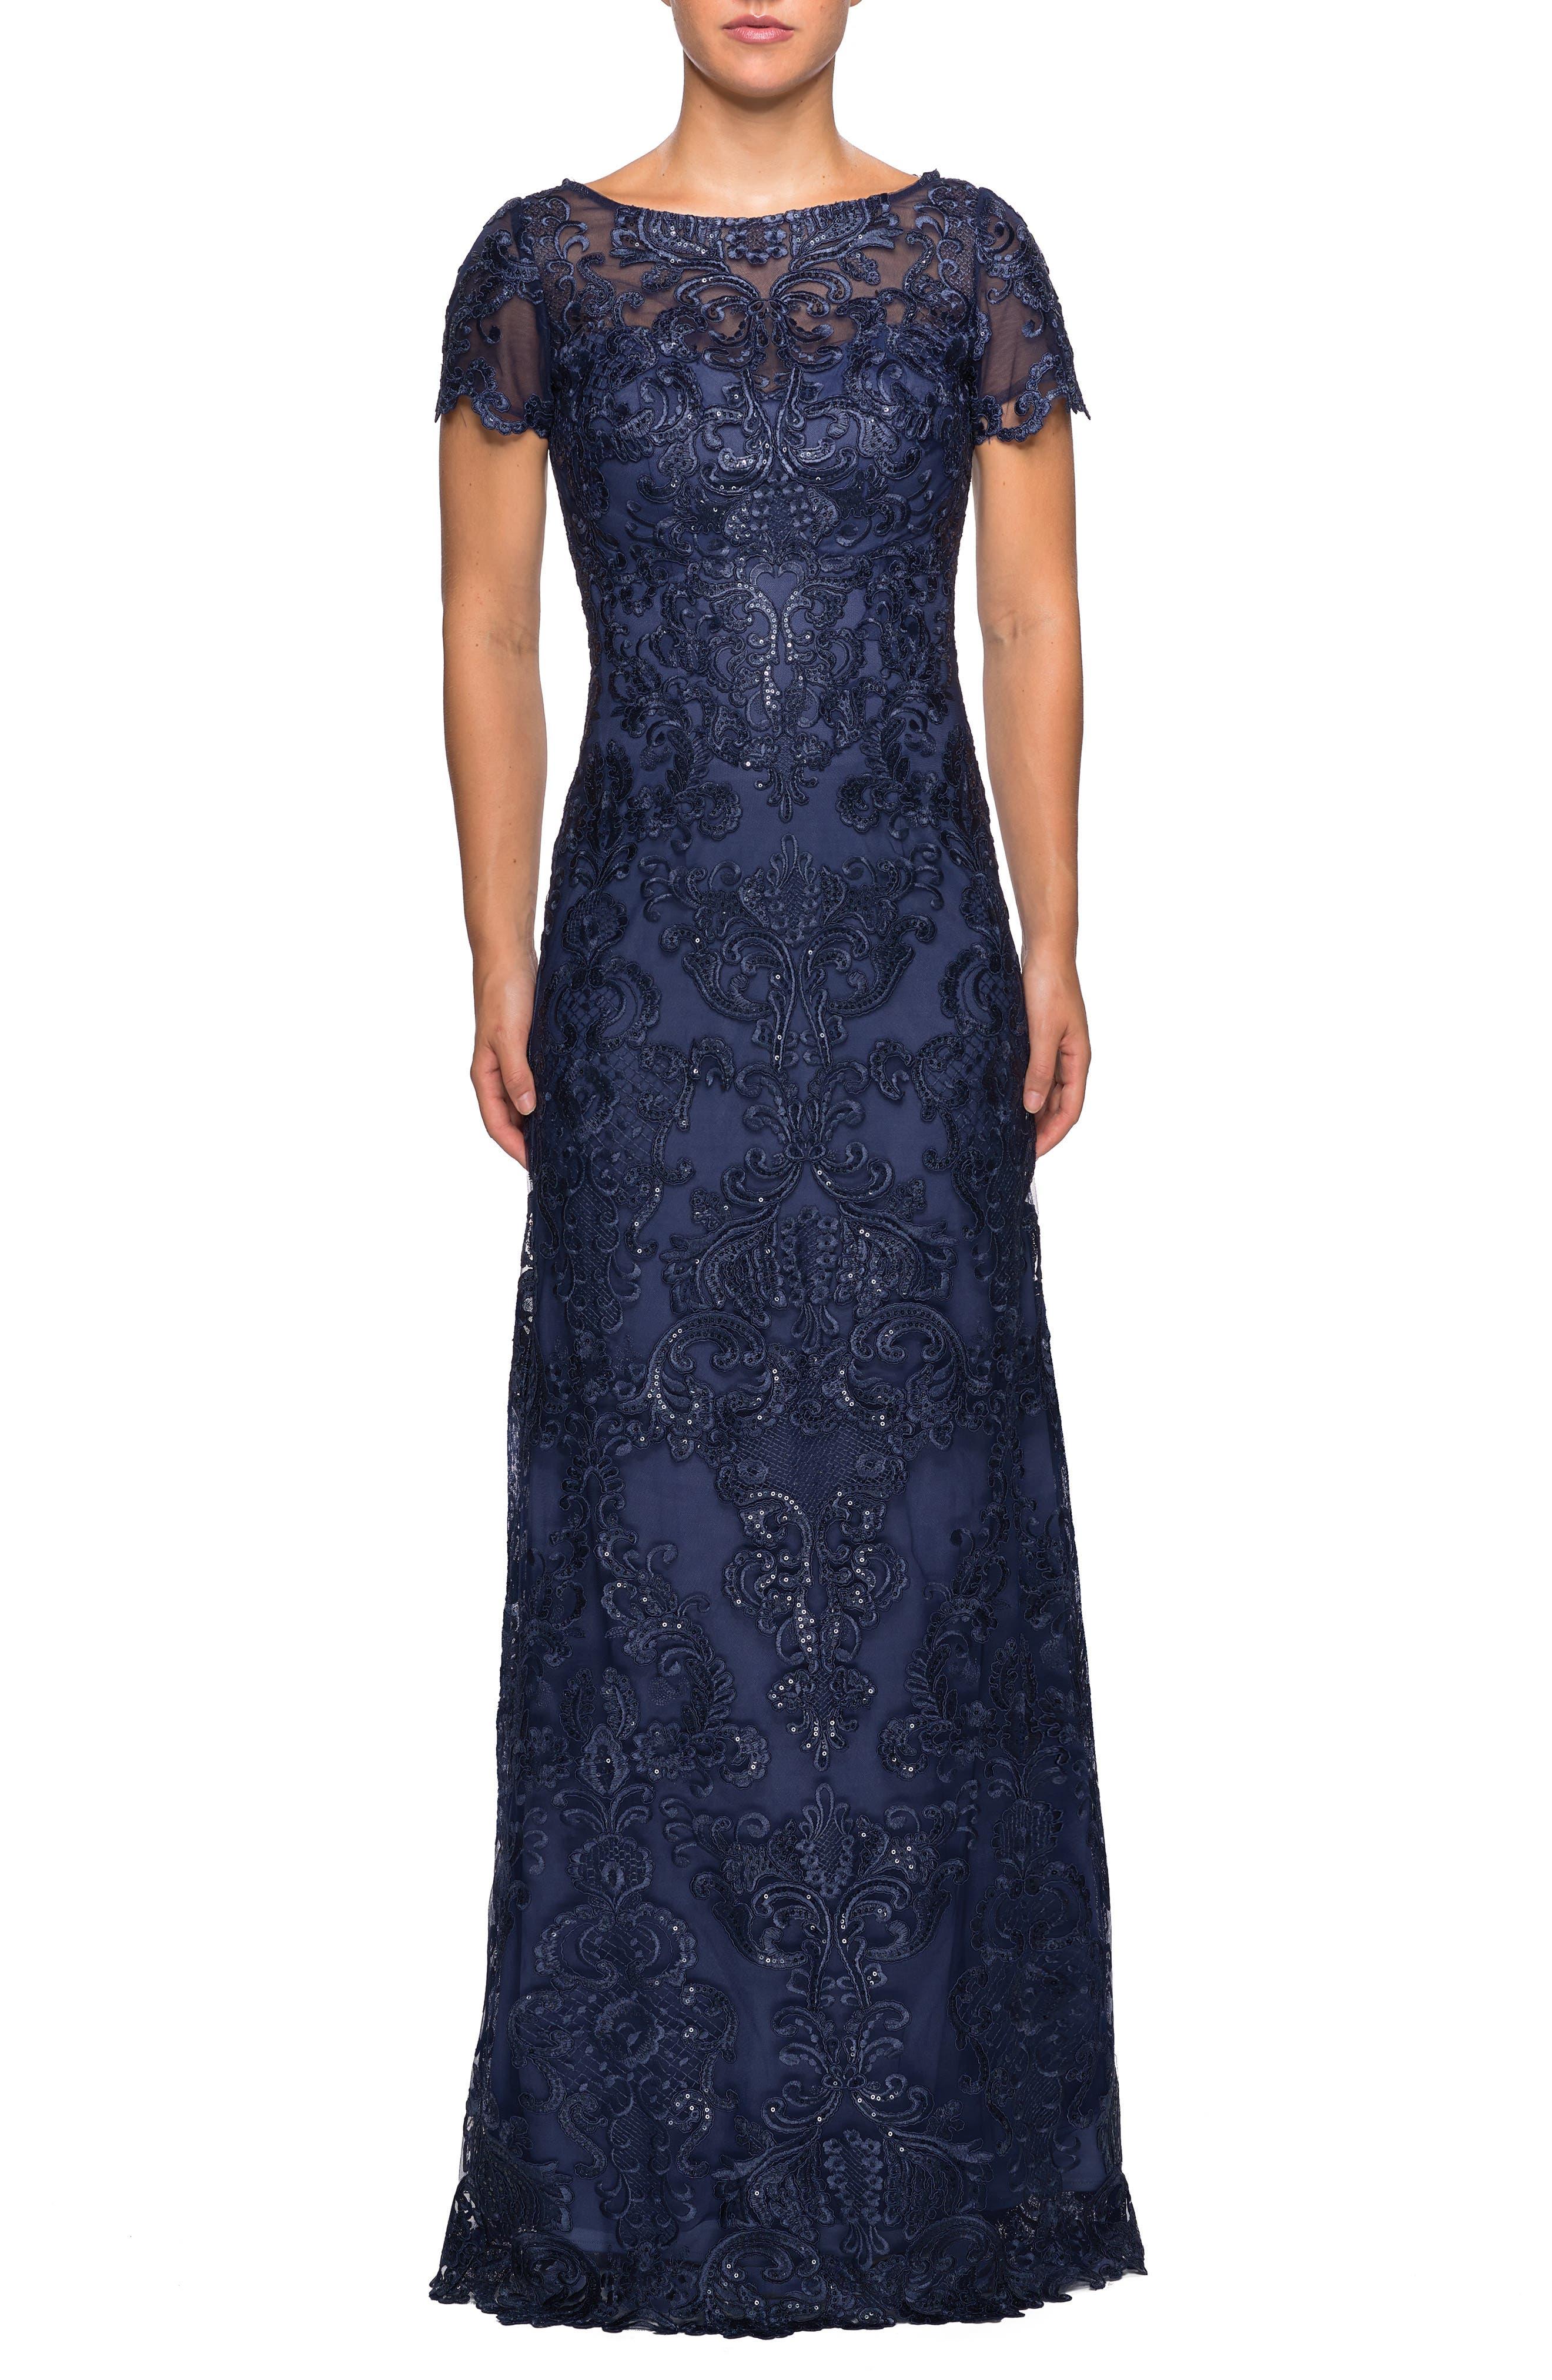 LA FEMME Sequin Embroidered Column Dress in Navy